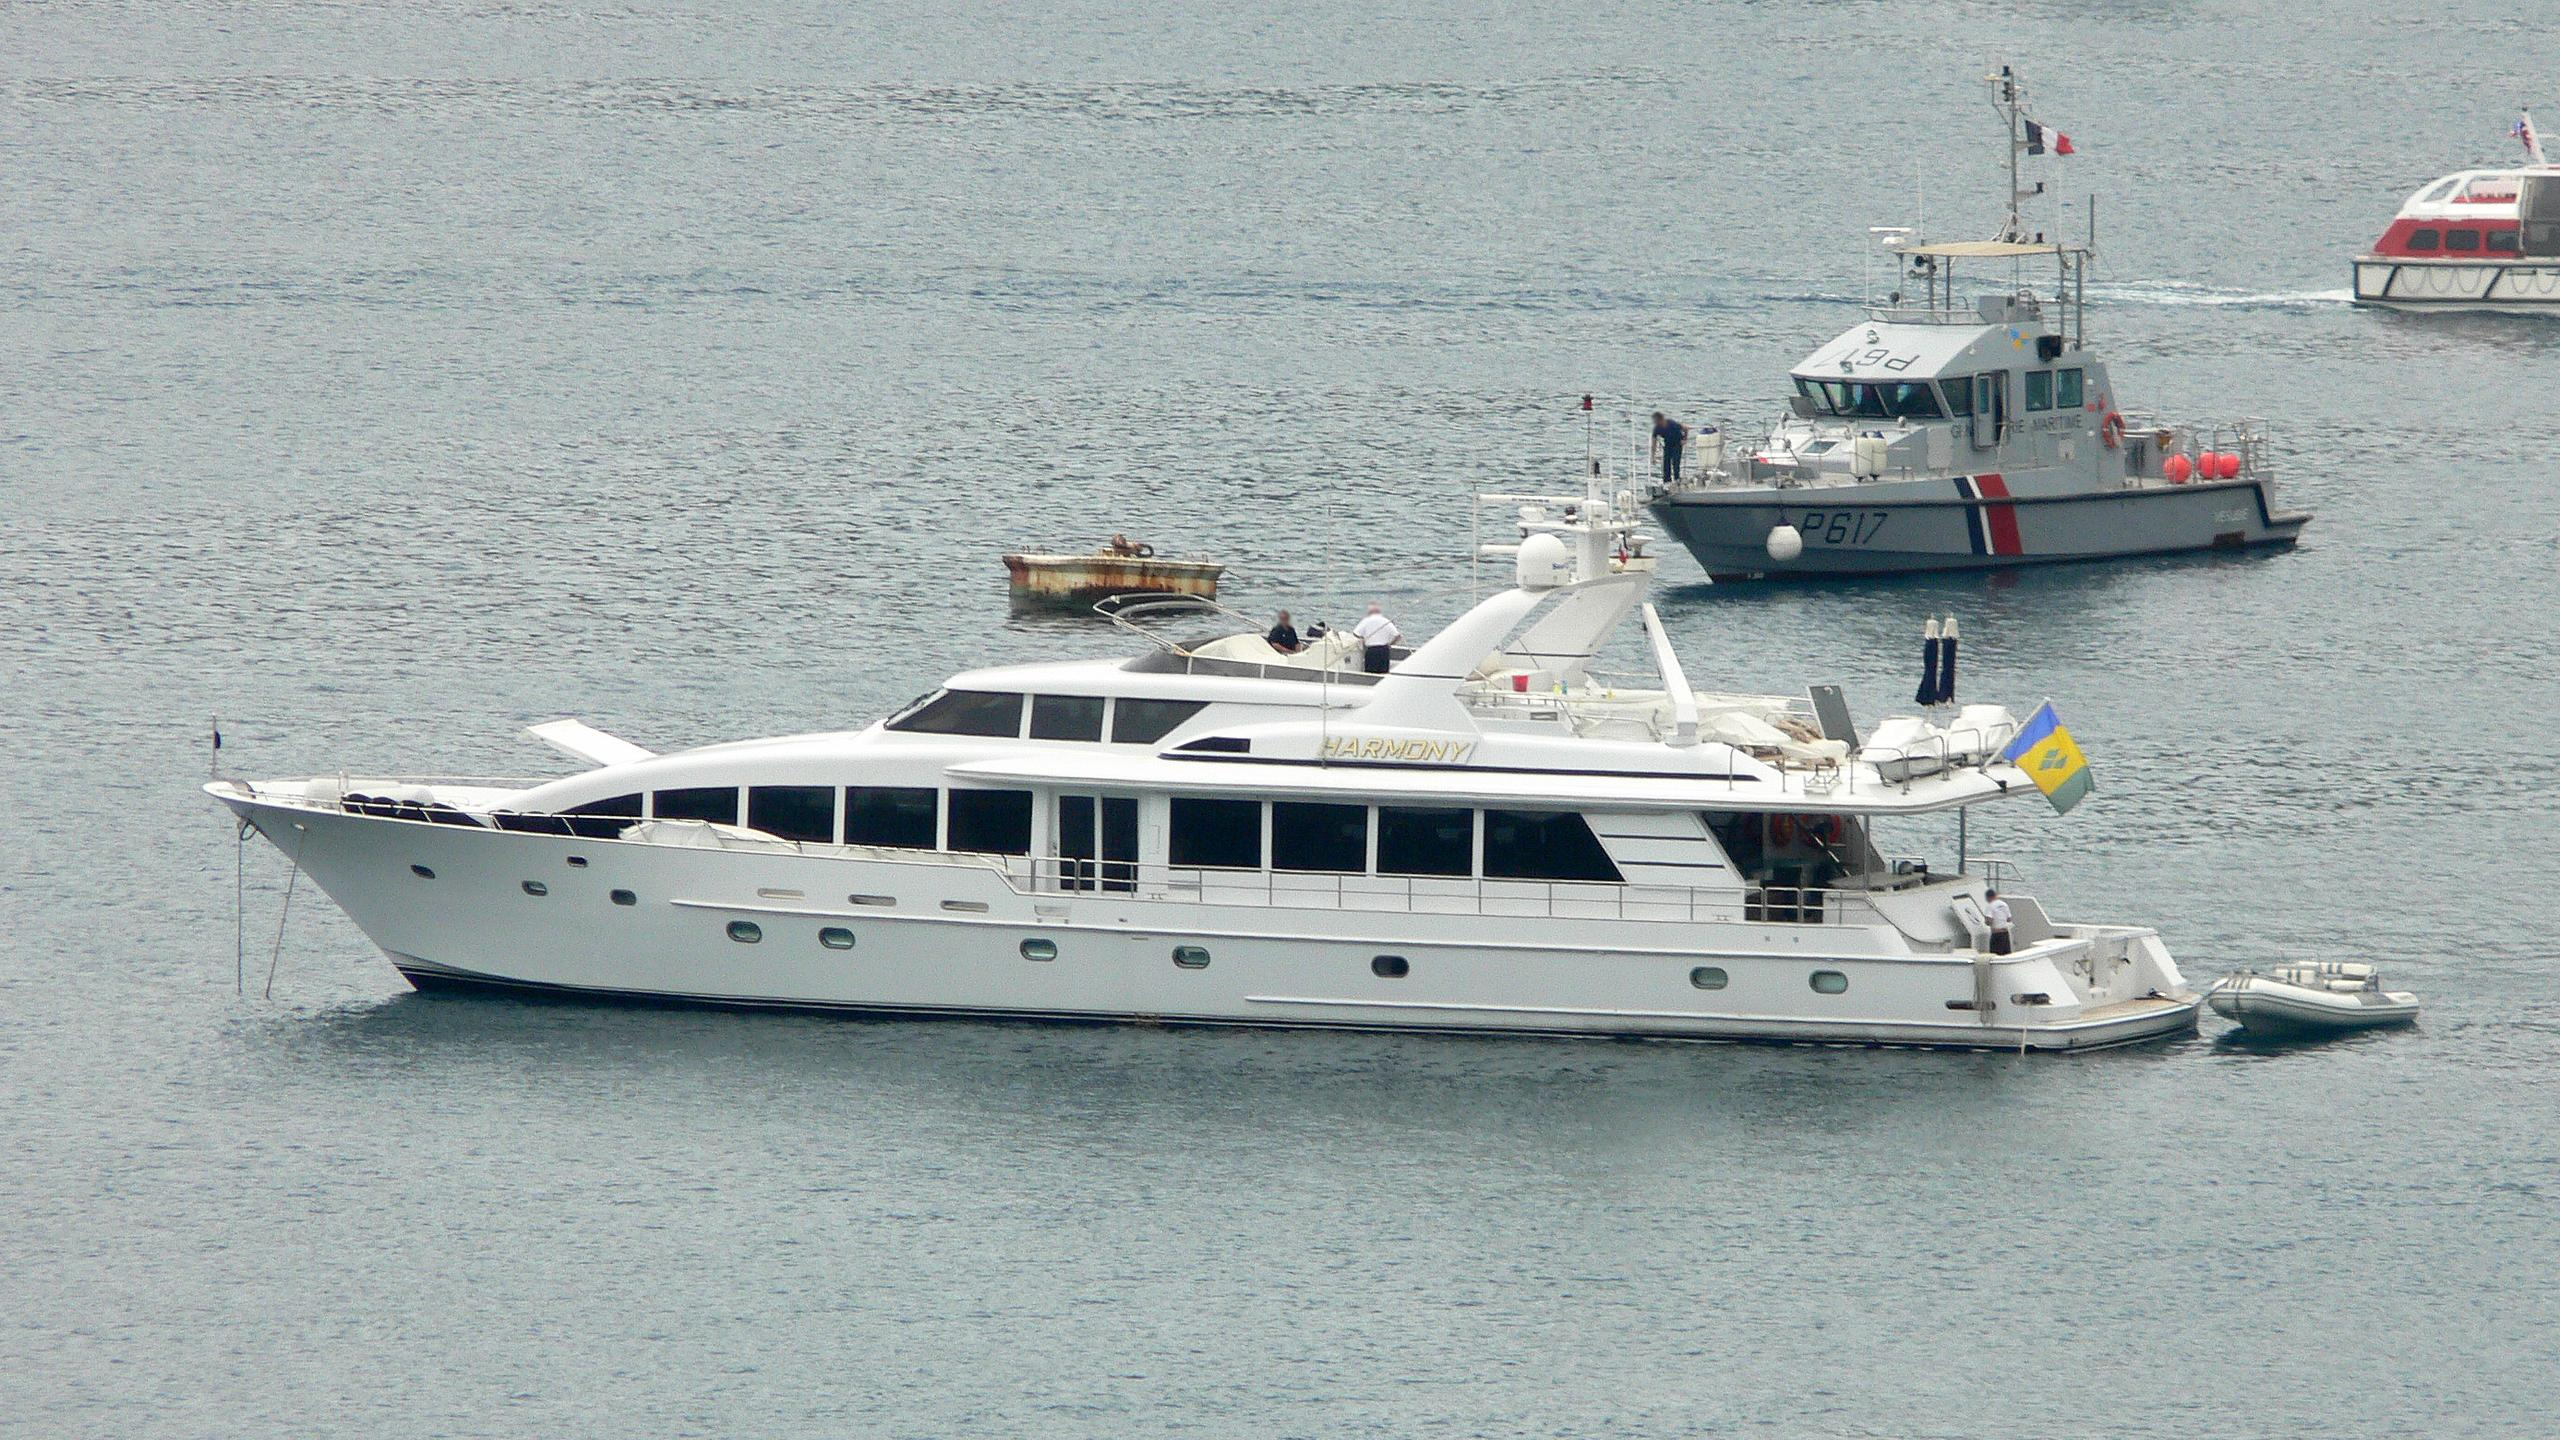 harmony-motor-yacht-crescent-custom-1999-35m-profile